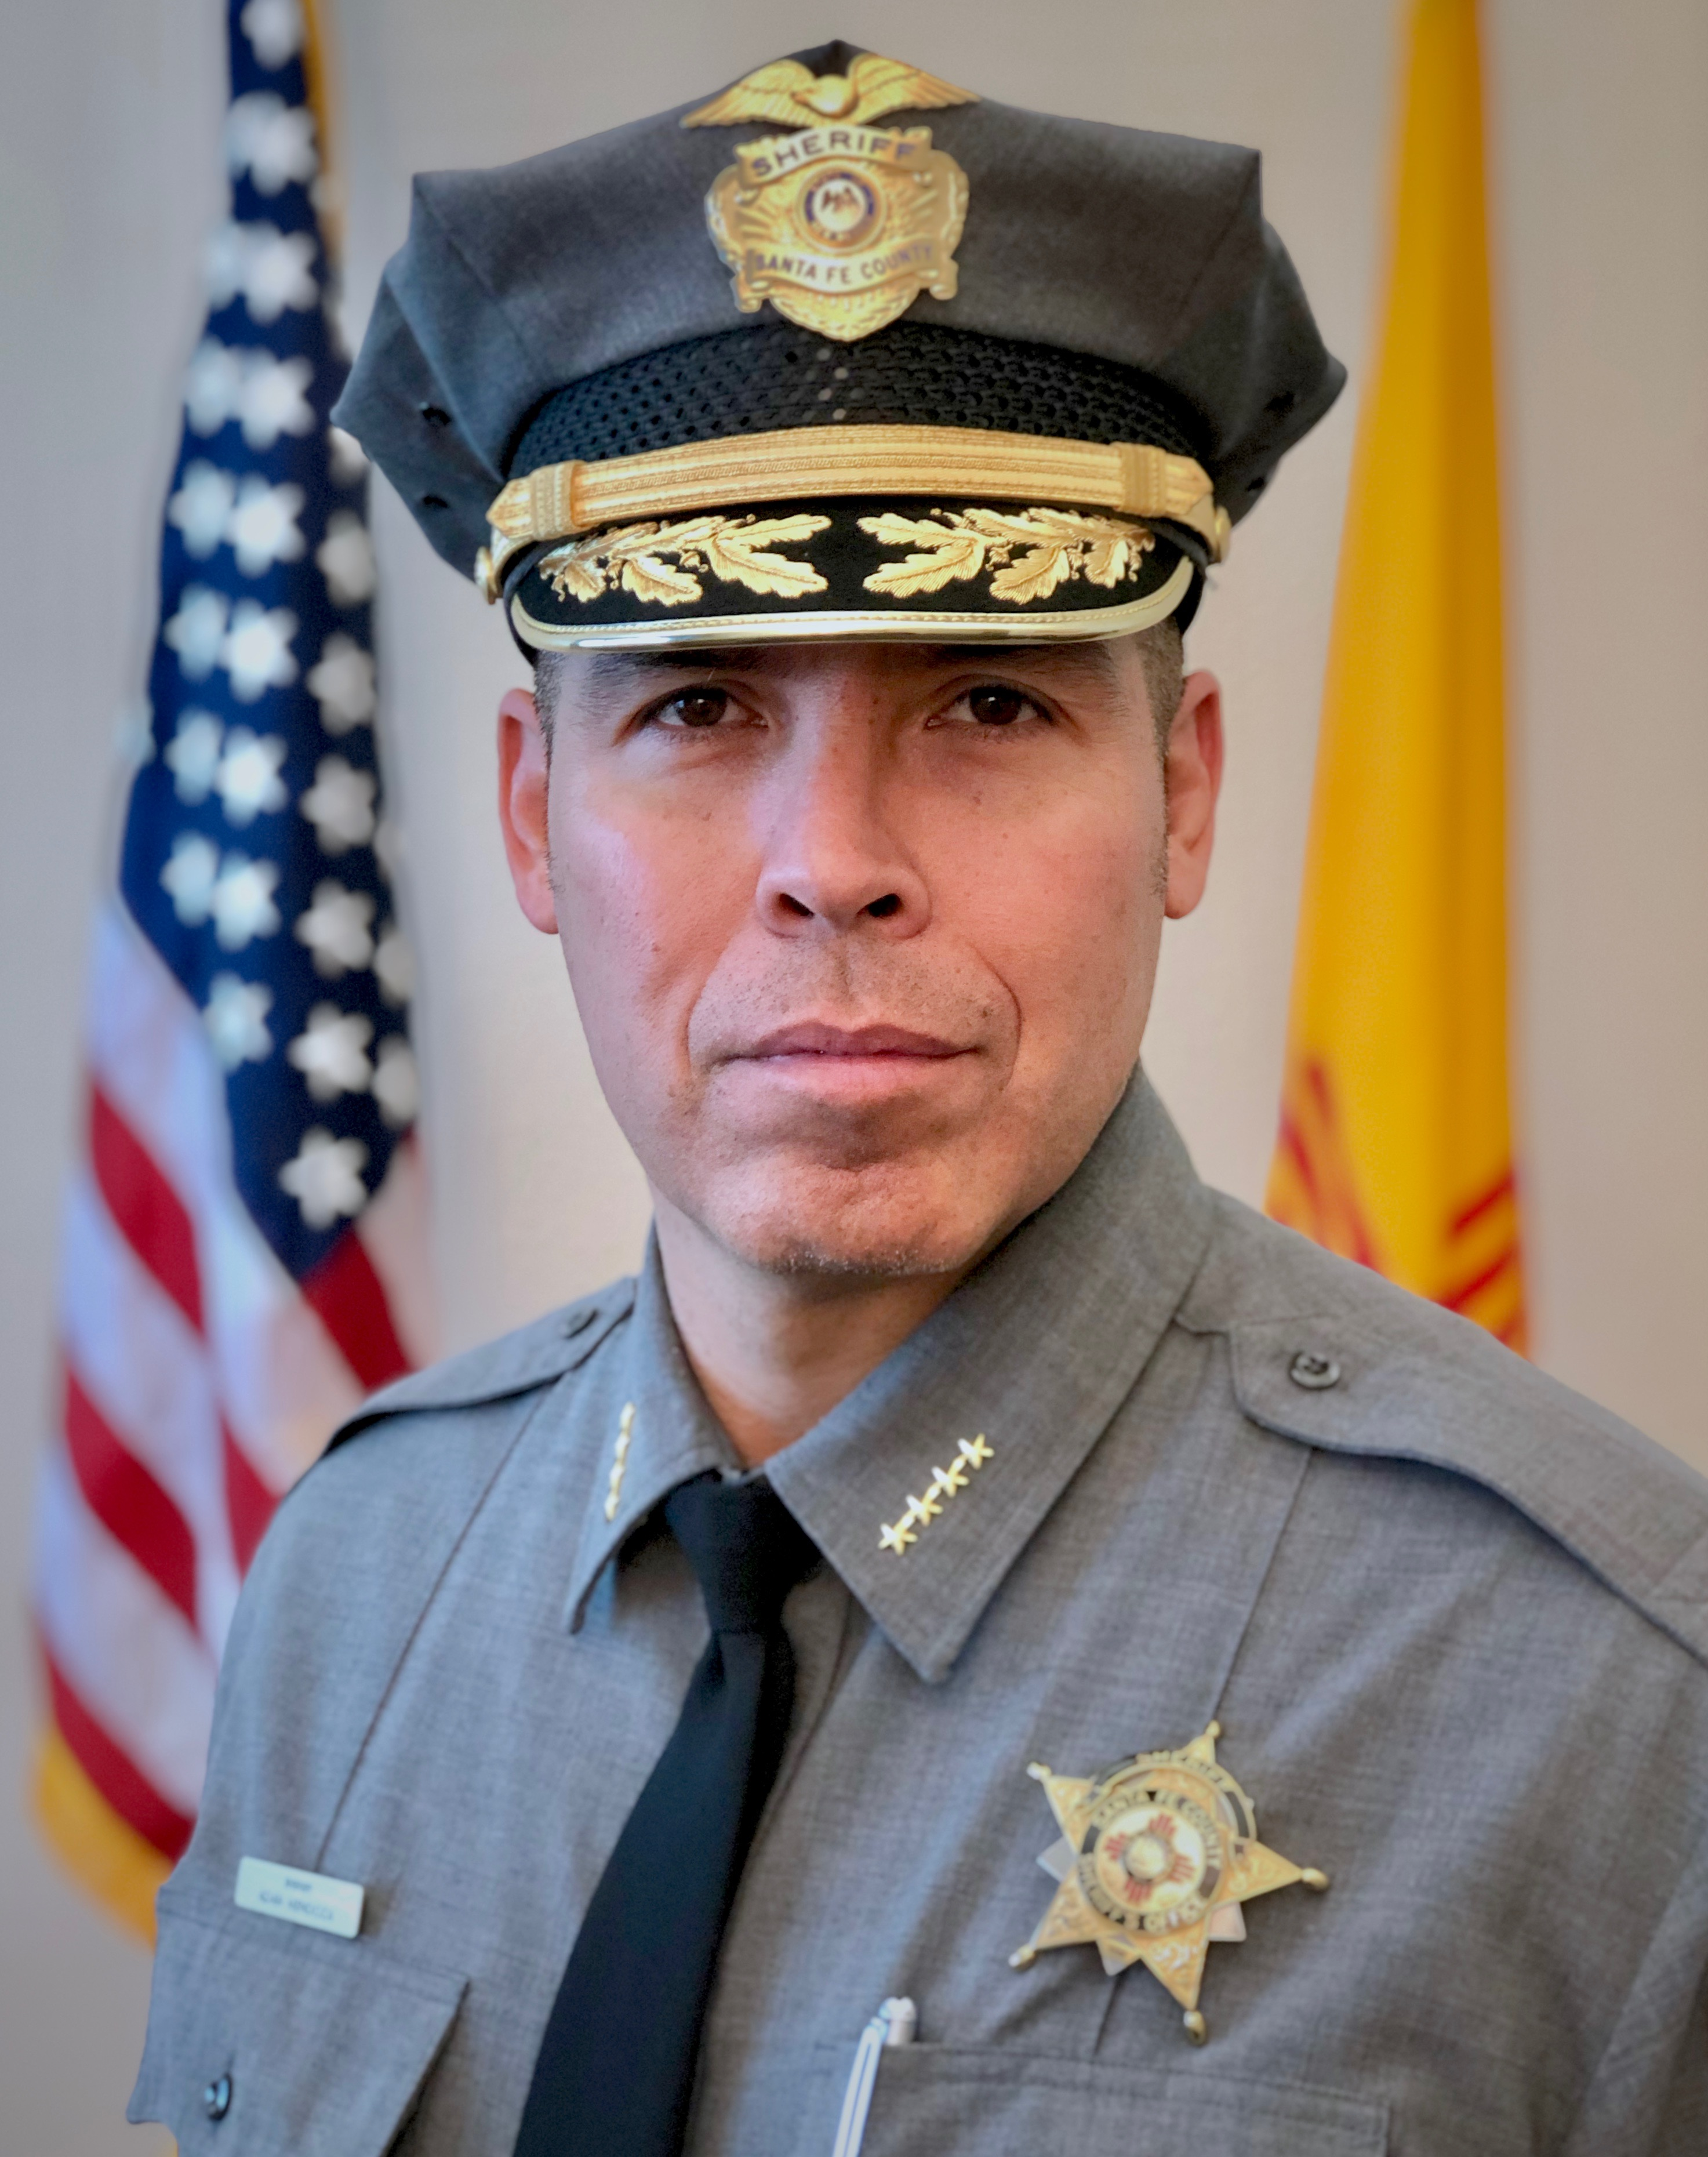 Santa Fe County : Sheriff : Divisions